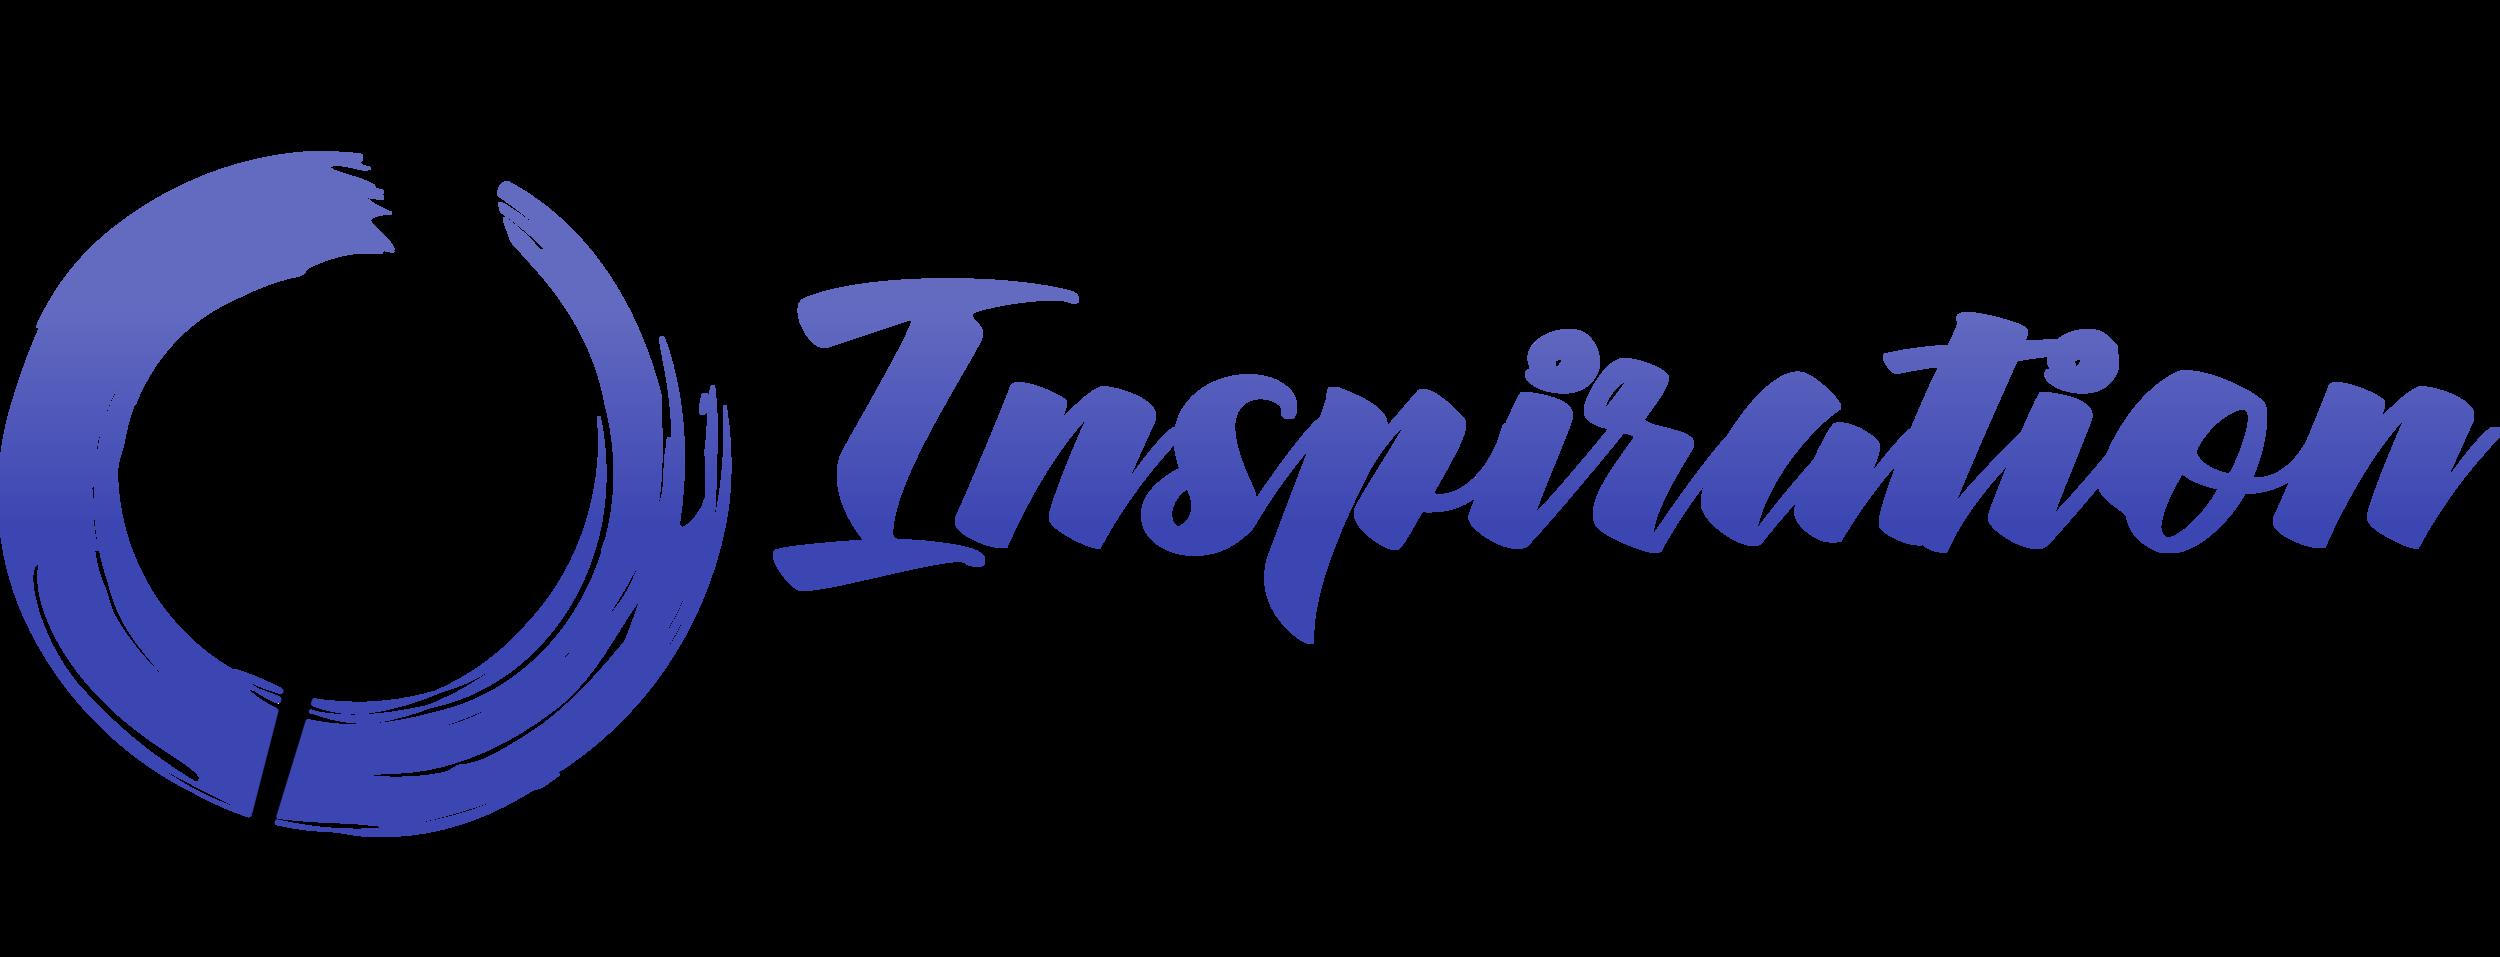 Inspiration Orlando Logo (PNG) - Fonts Used: Gineva and Raleway